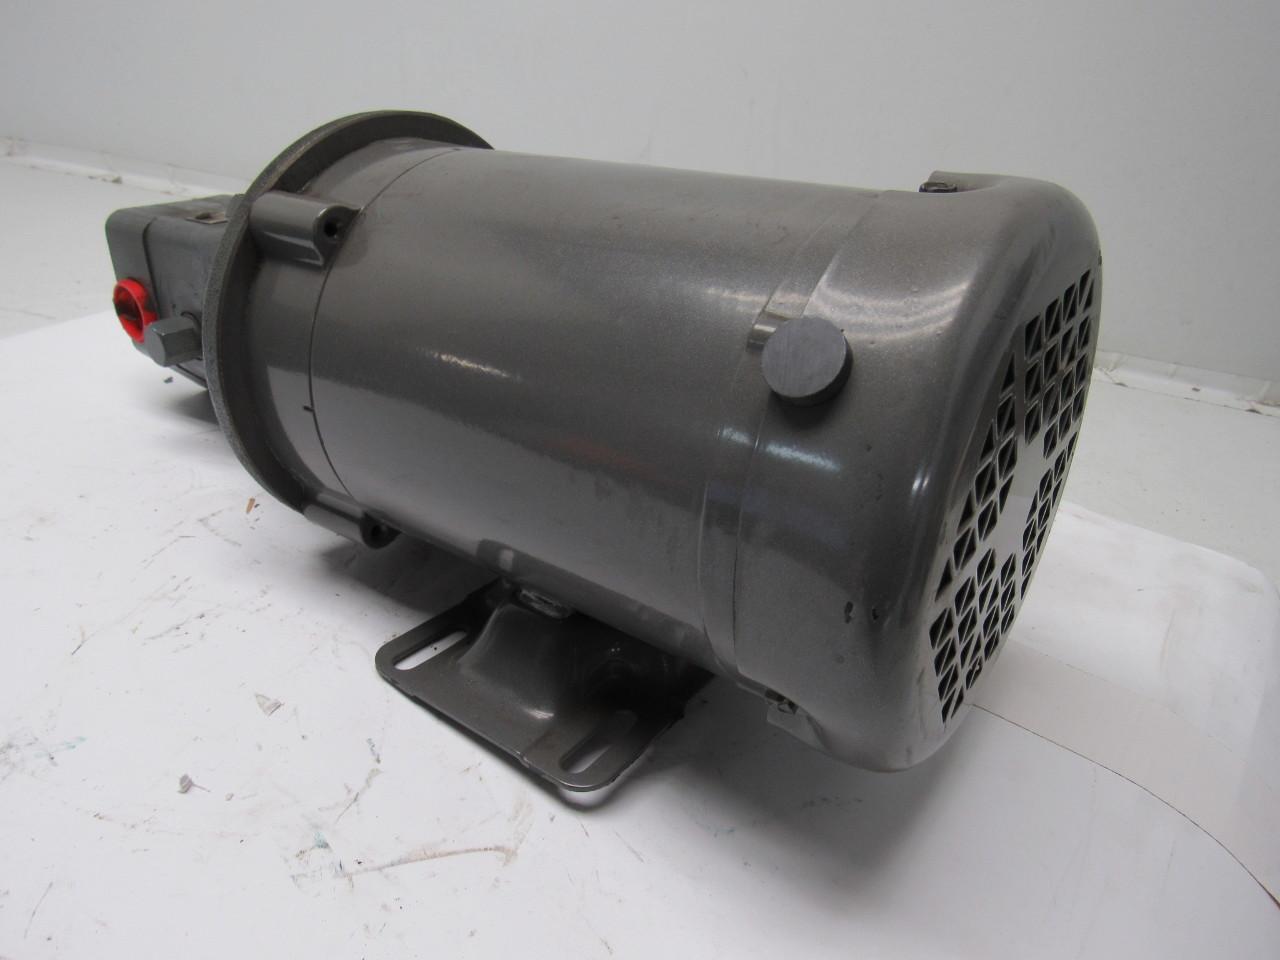 Baldor viking vm3538 7r948c1 hydraulic pump 1 2 hp for 1 1 2 hp electric motor